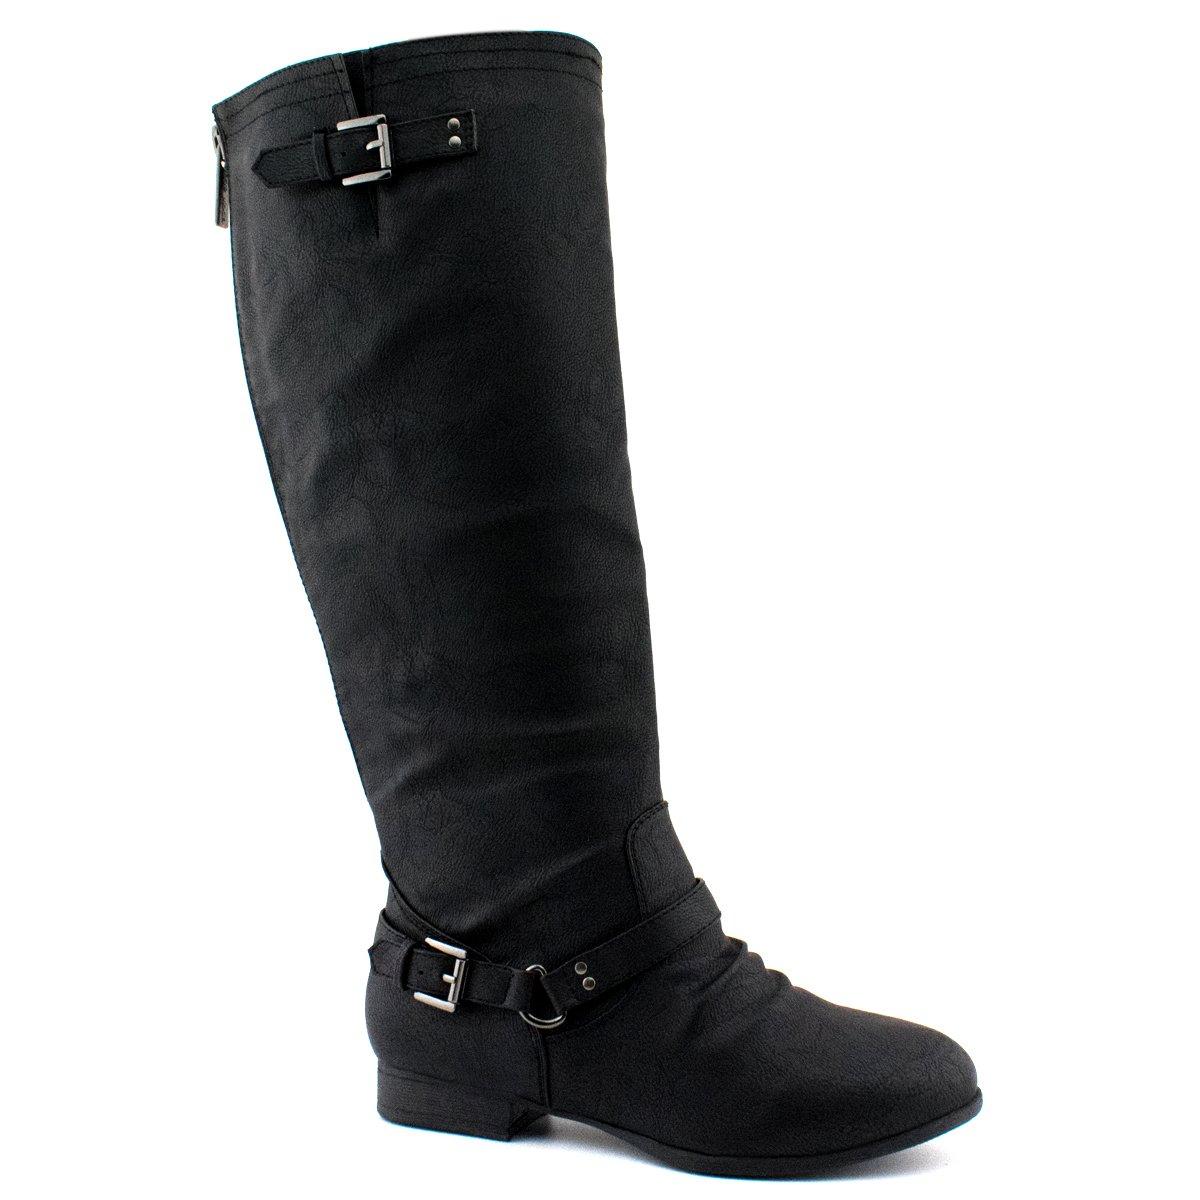 Top Moda Women's Coco 1 Knee High Riding Boot, TPS Coco-1 v2 Black Size 10